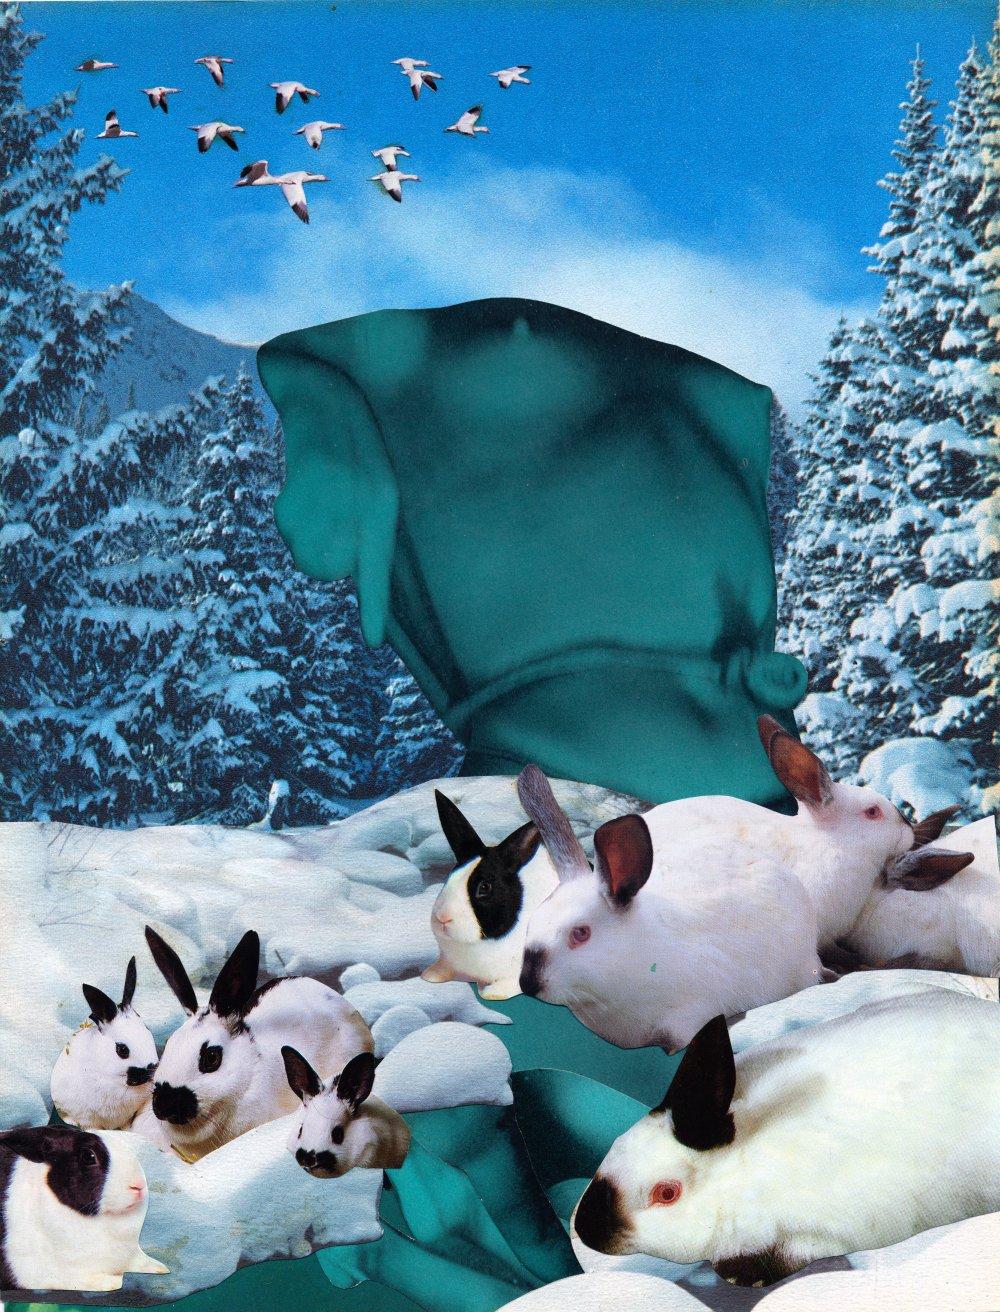 Blue Nude with Snow Bunnies